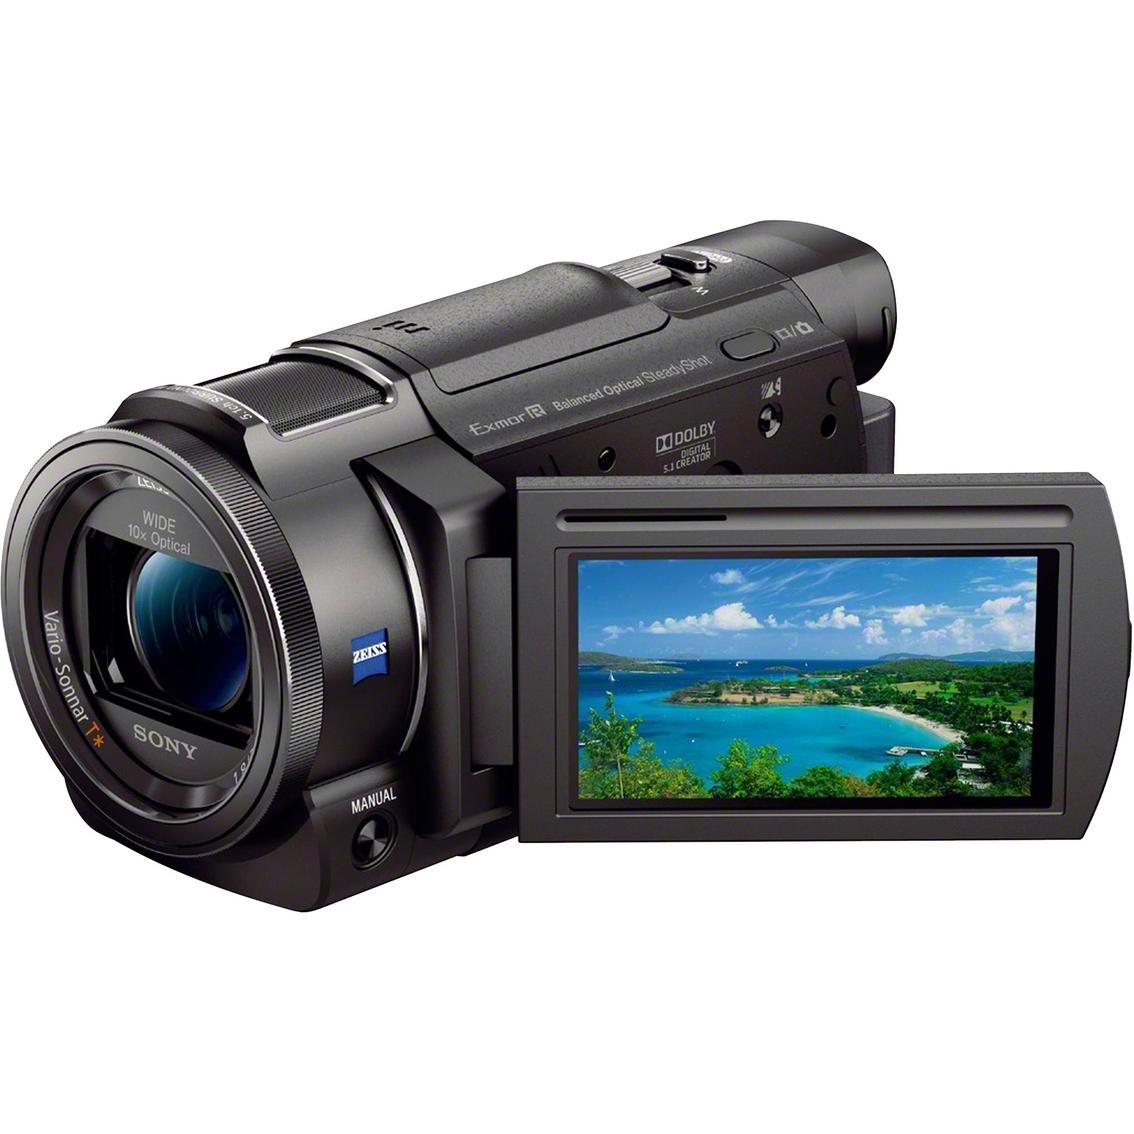 Sony Handycam 4k Camcorder With 1 2 3 Exmor R Cmos Sensor Camcorders Electronics Shop The Exchange